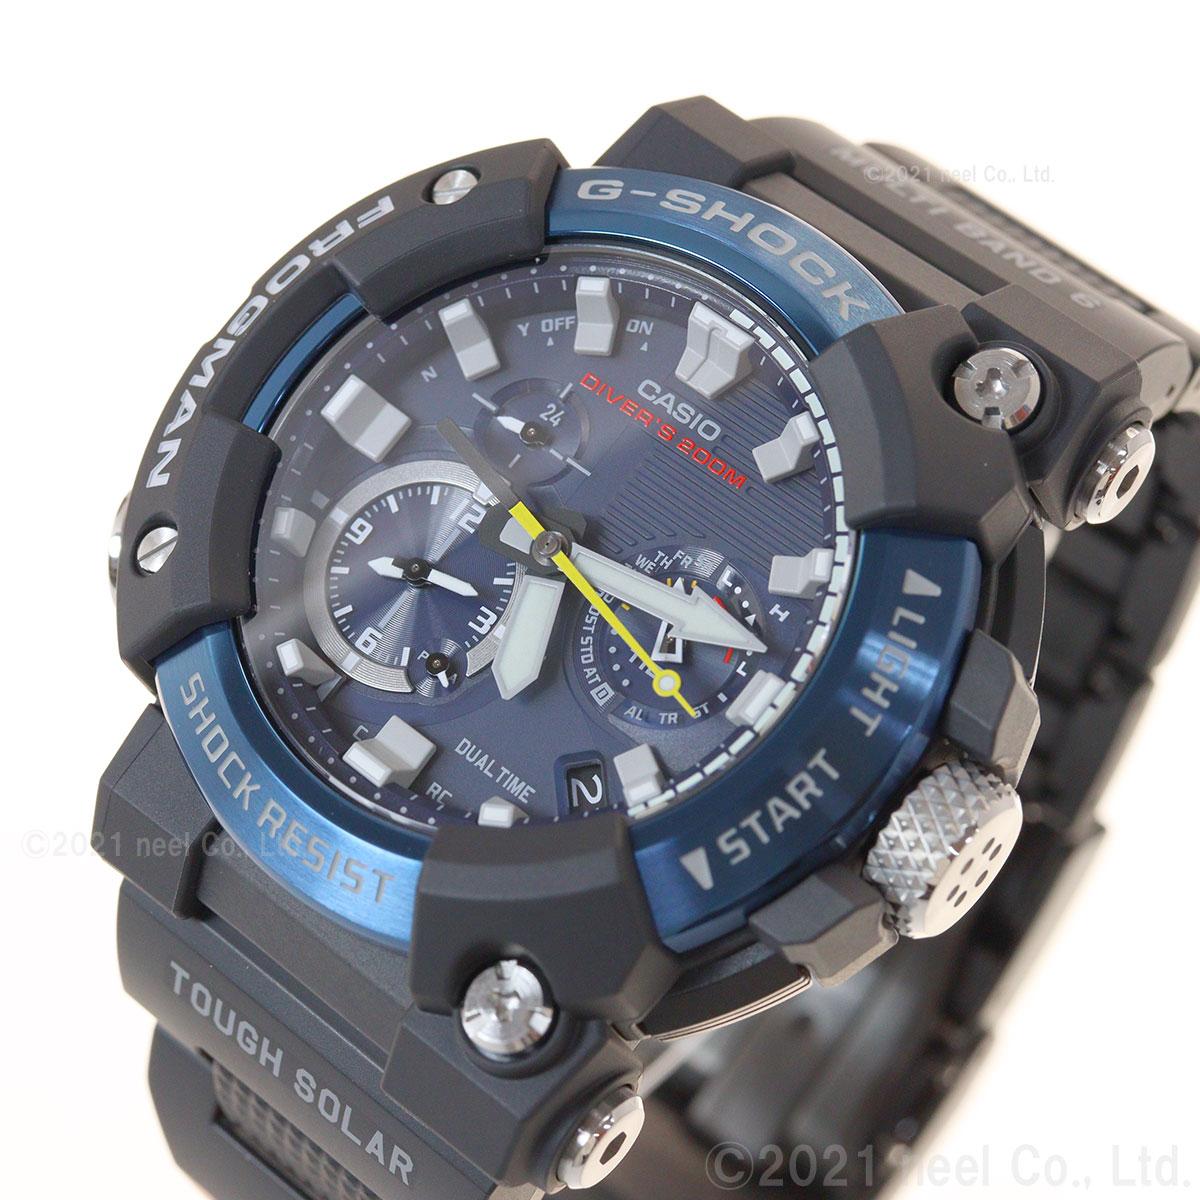 G-SHOCK 電波 ソーラー 電波時計 カシオ Gショック フロッグマン CASIO FROGMAN 腕時計 メンズ MASTER OF G GWF-A1000C-1AJF